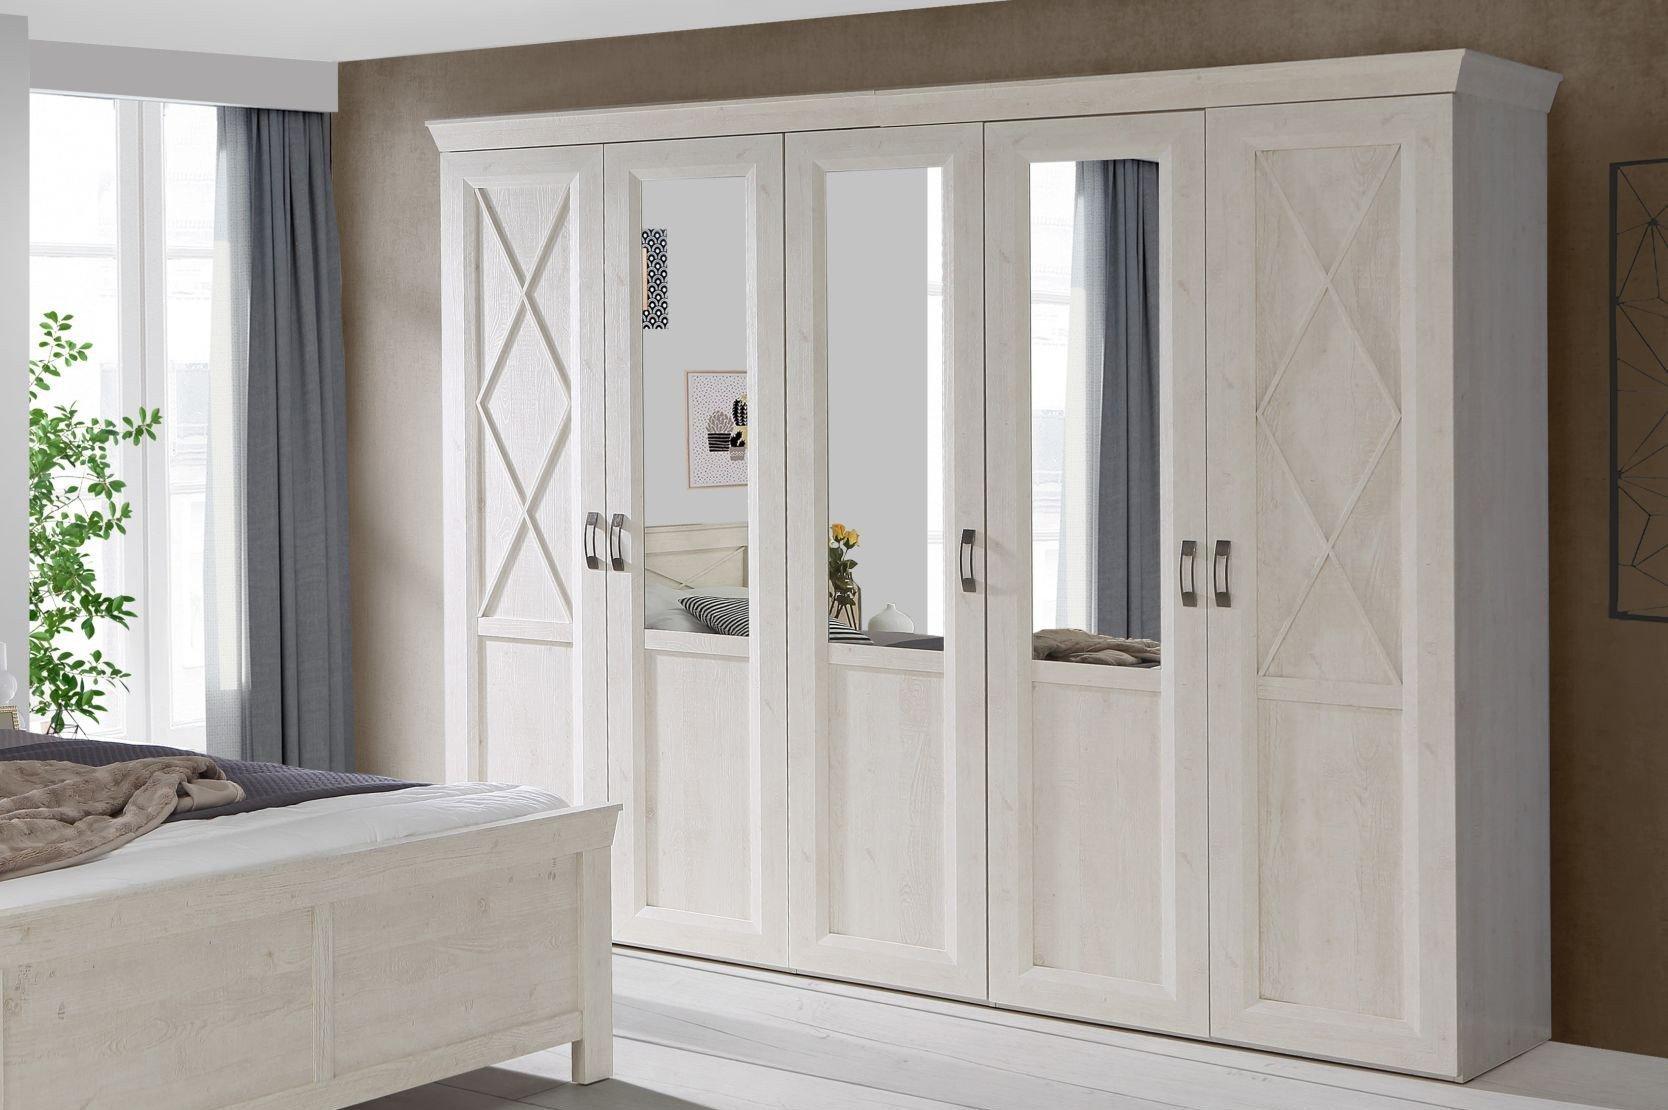 forte landhaus schrank kashmir wei kiefer m bel letz ihr online shop. Black Bedroom Furniture Sets. Home Design Ideas